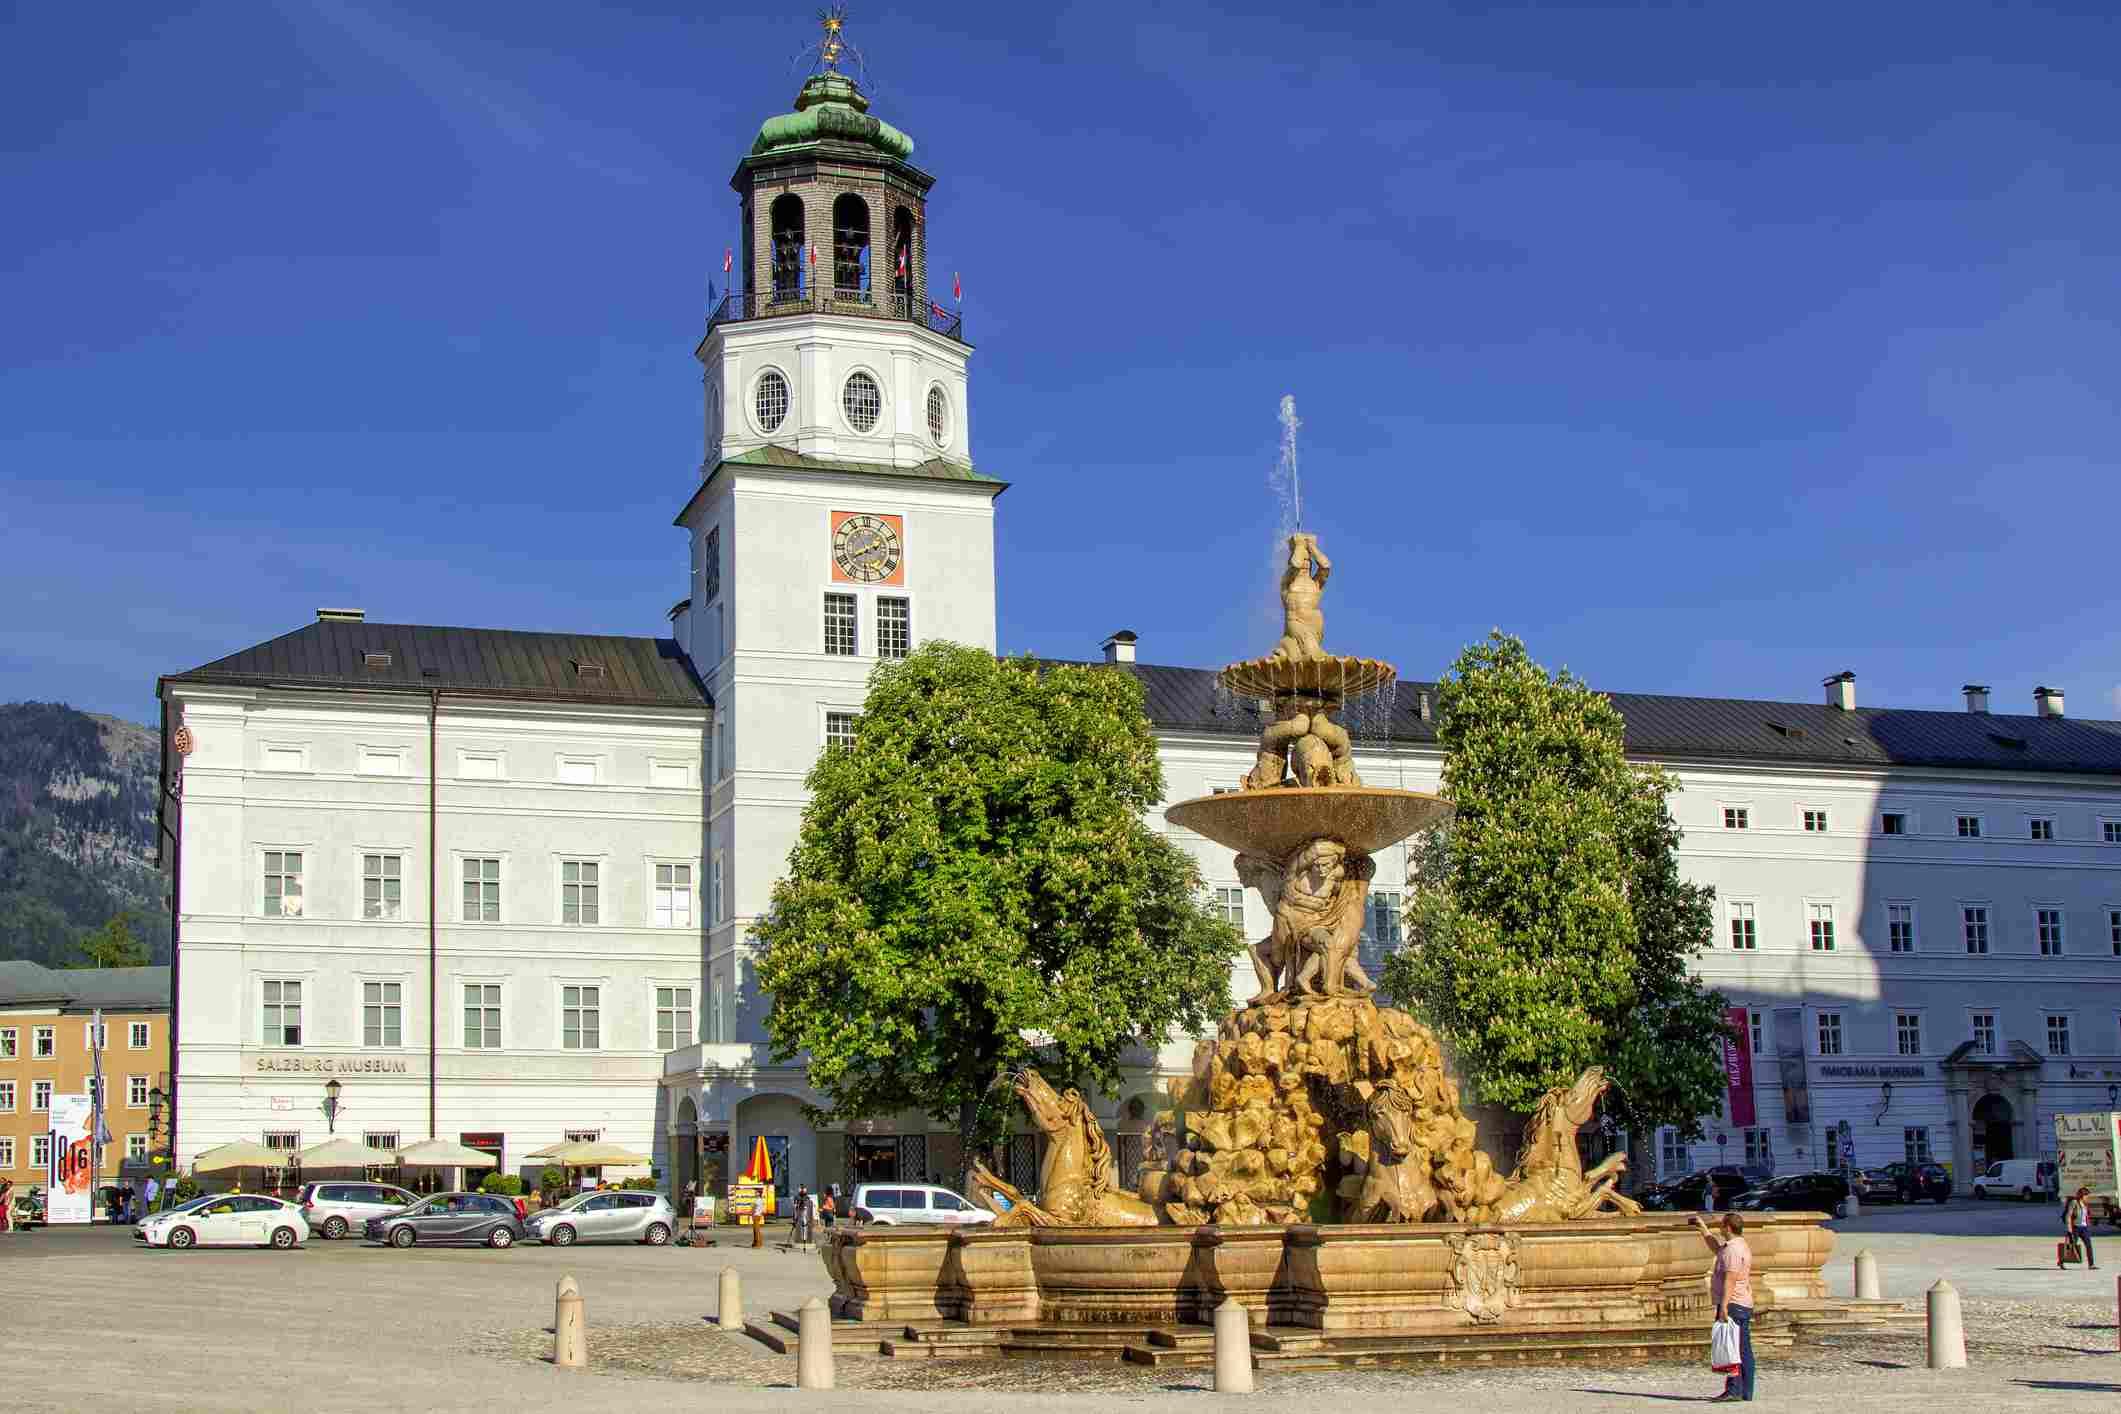 The fountain of the Residenzplatz square in Salzburg